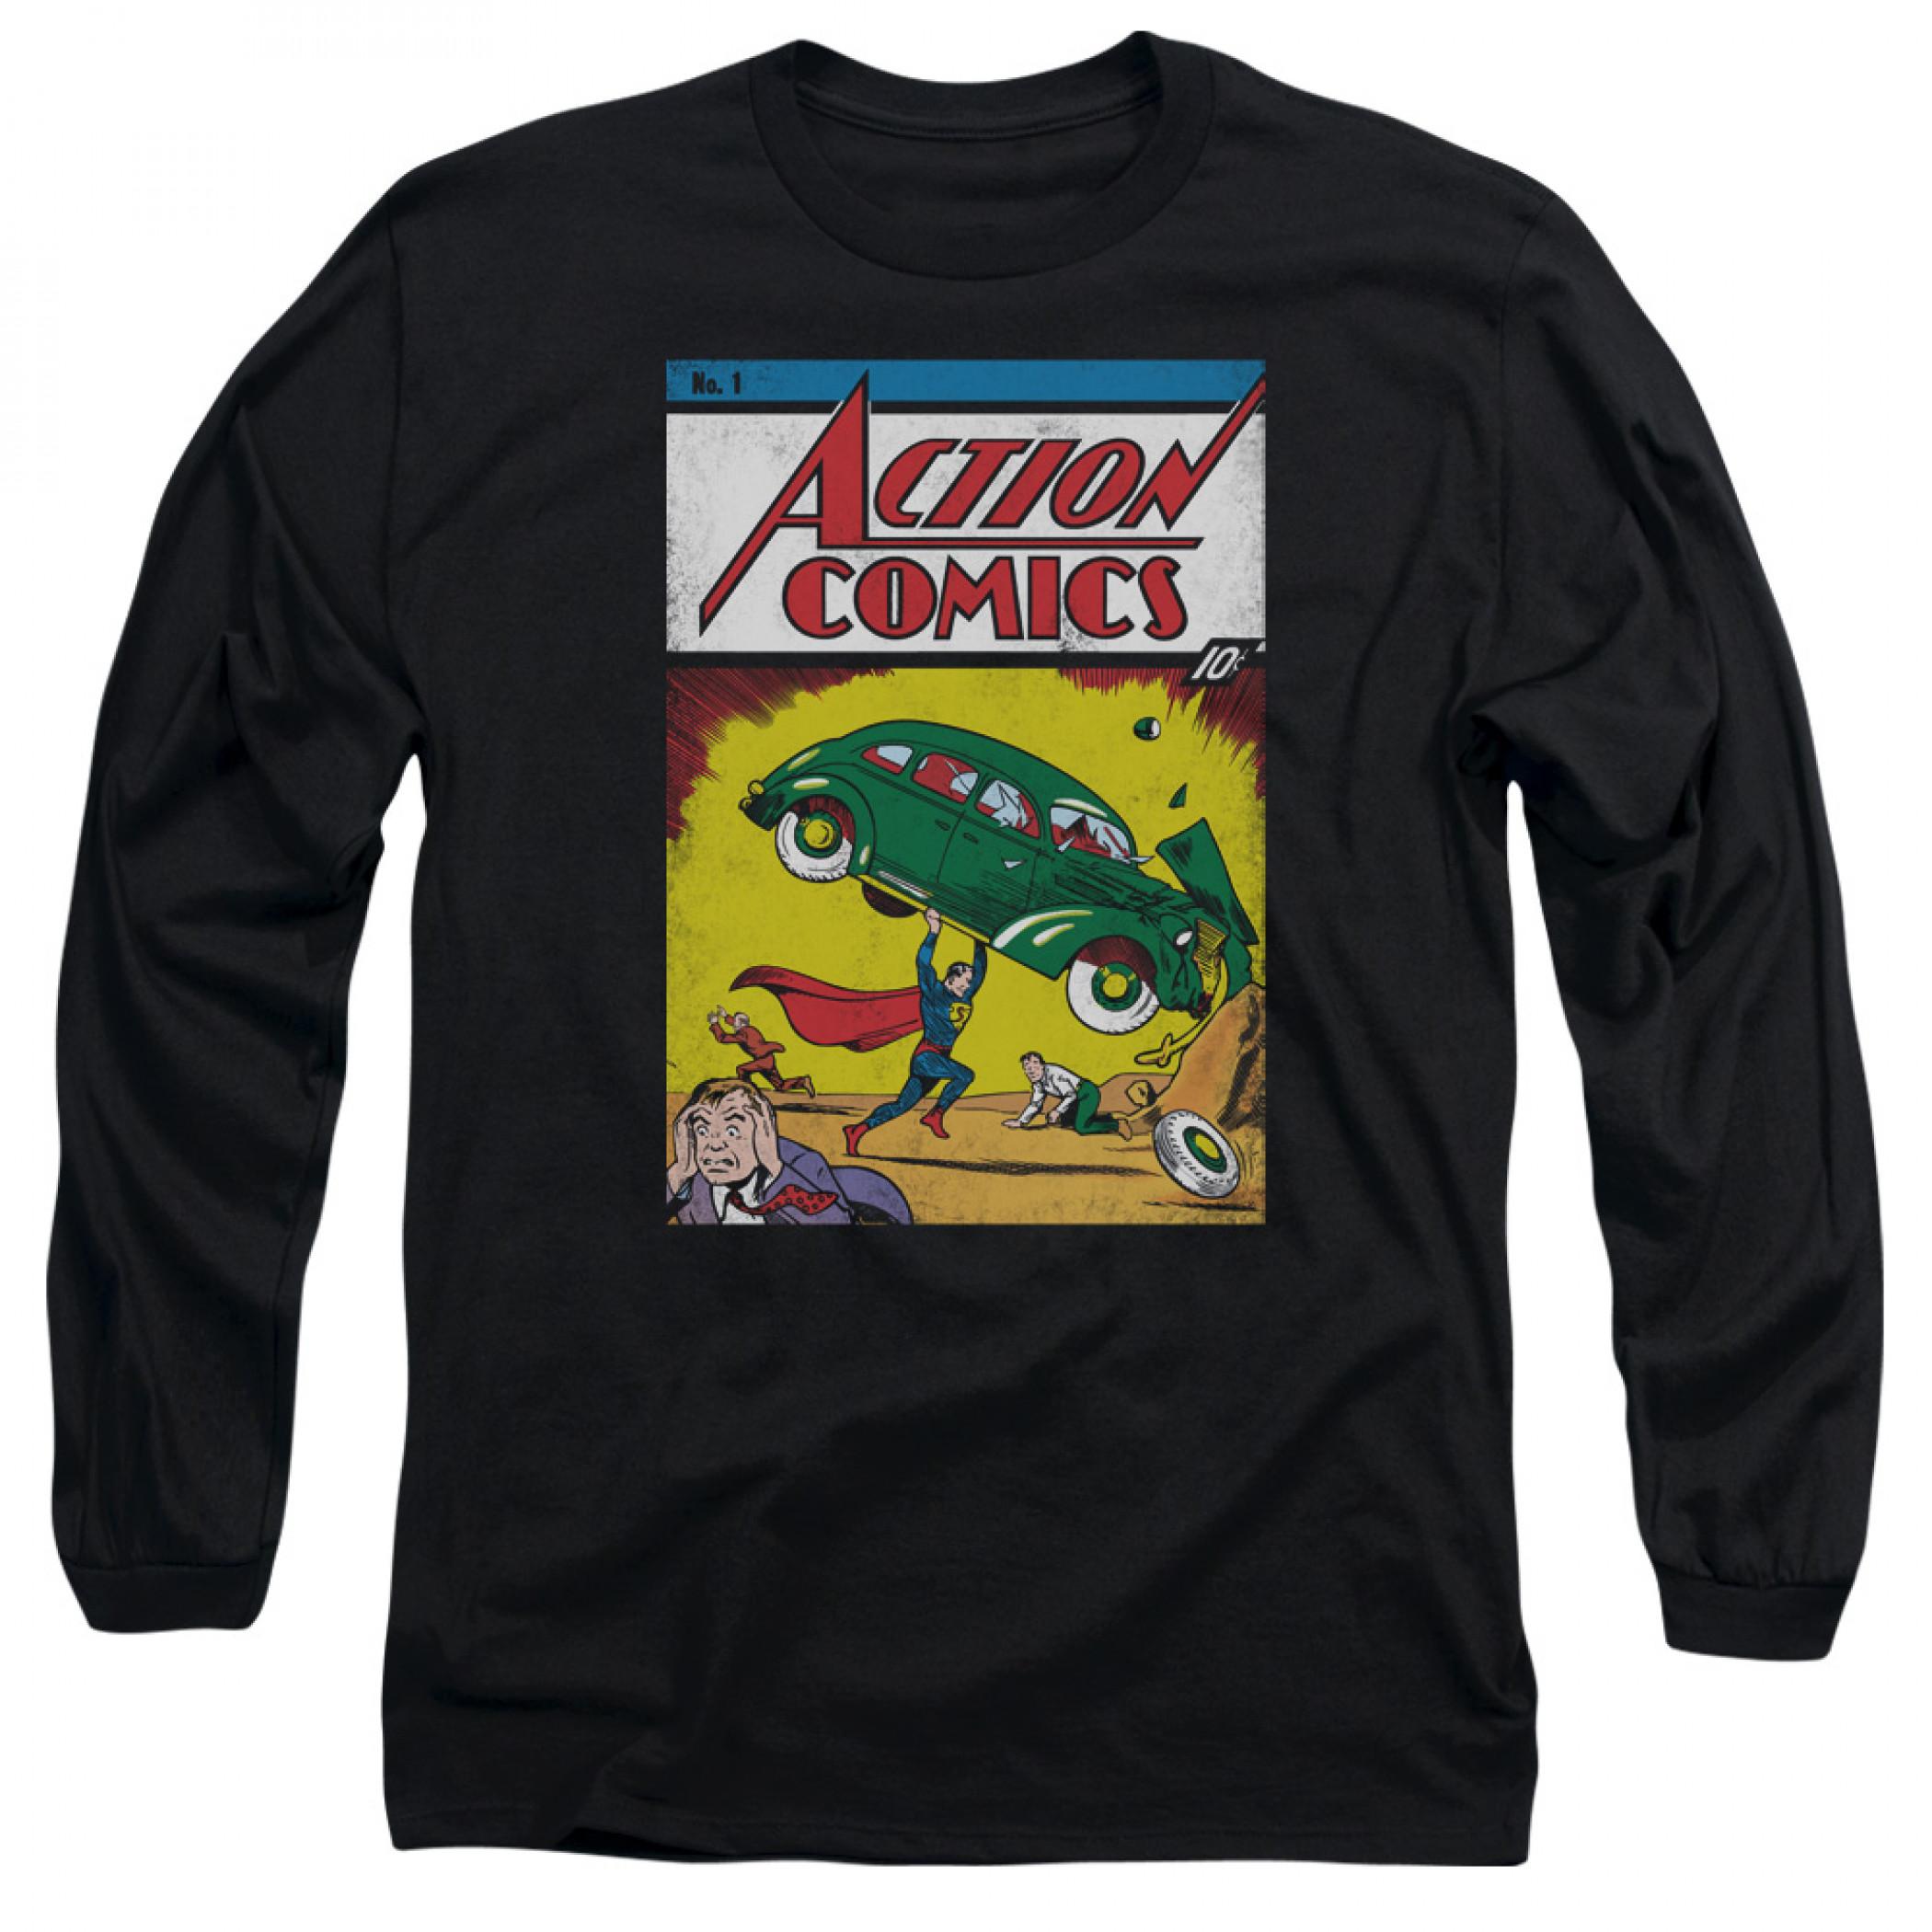 Superman Action Comics #1 Men's Black Long Sleeve Shirt